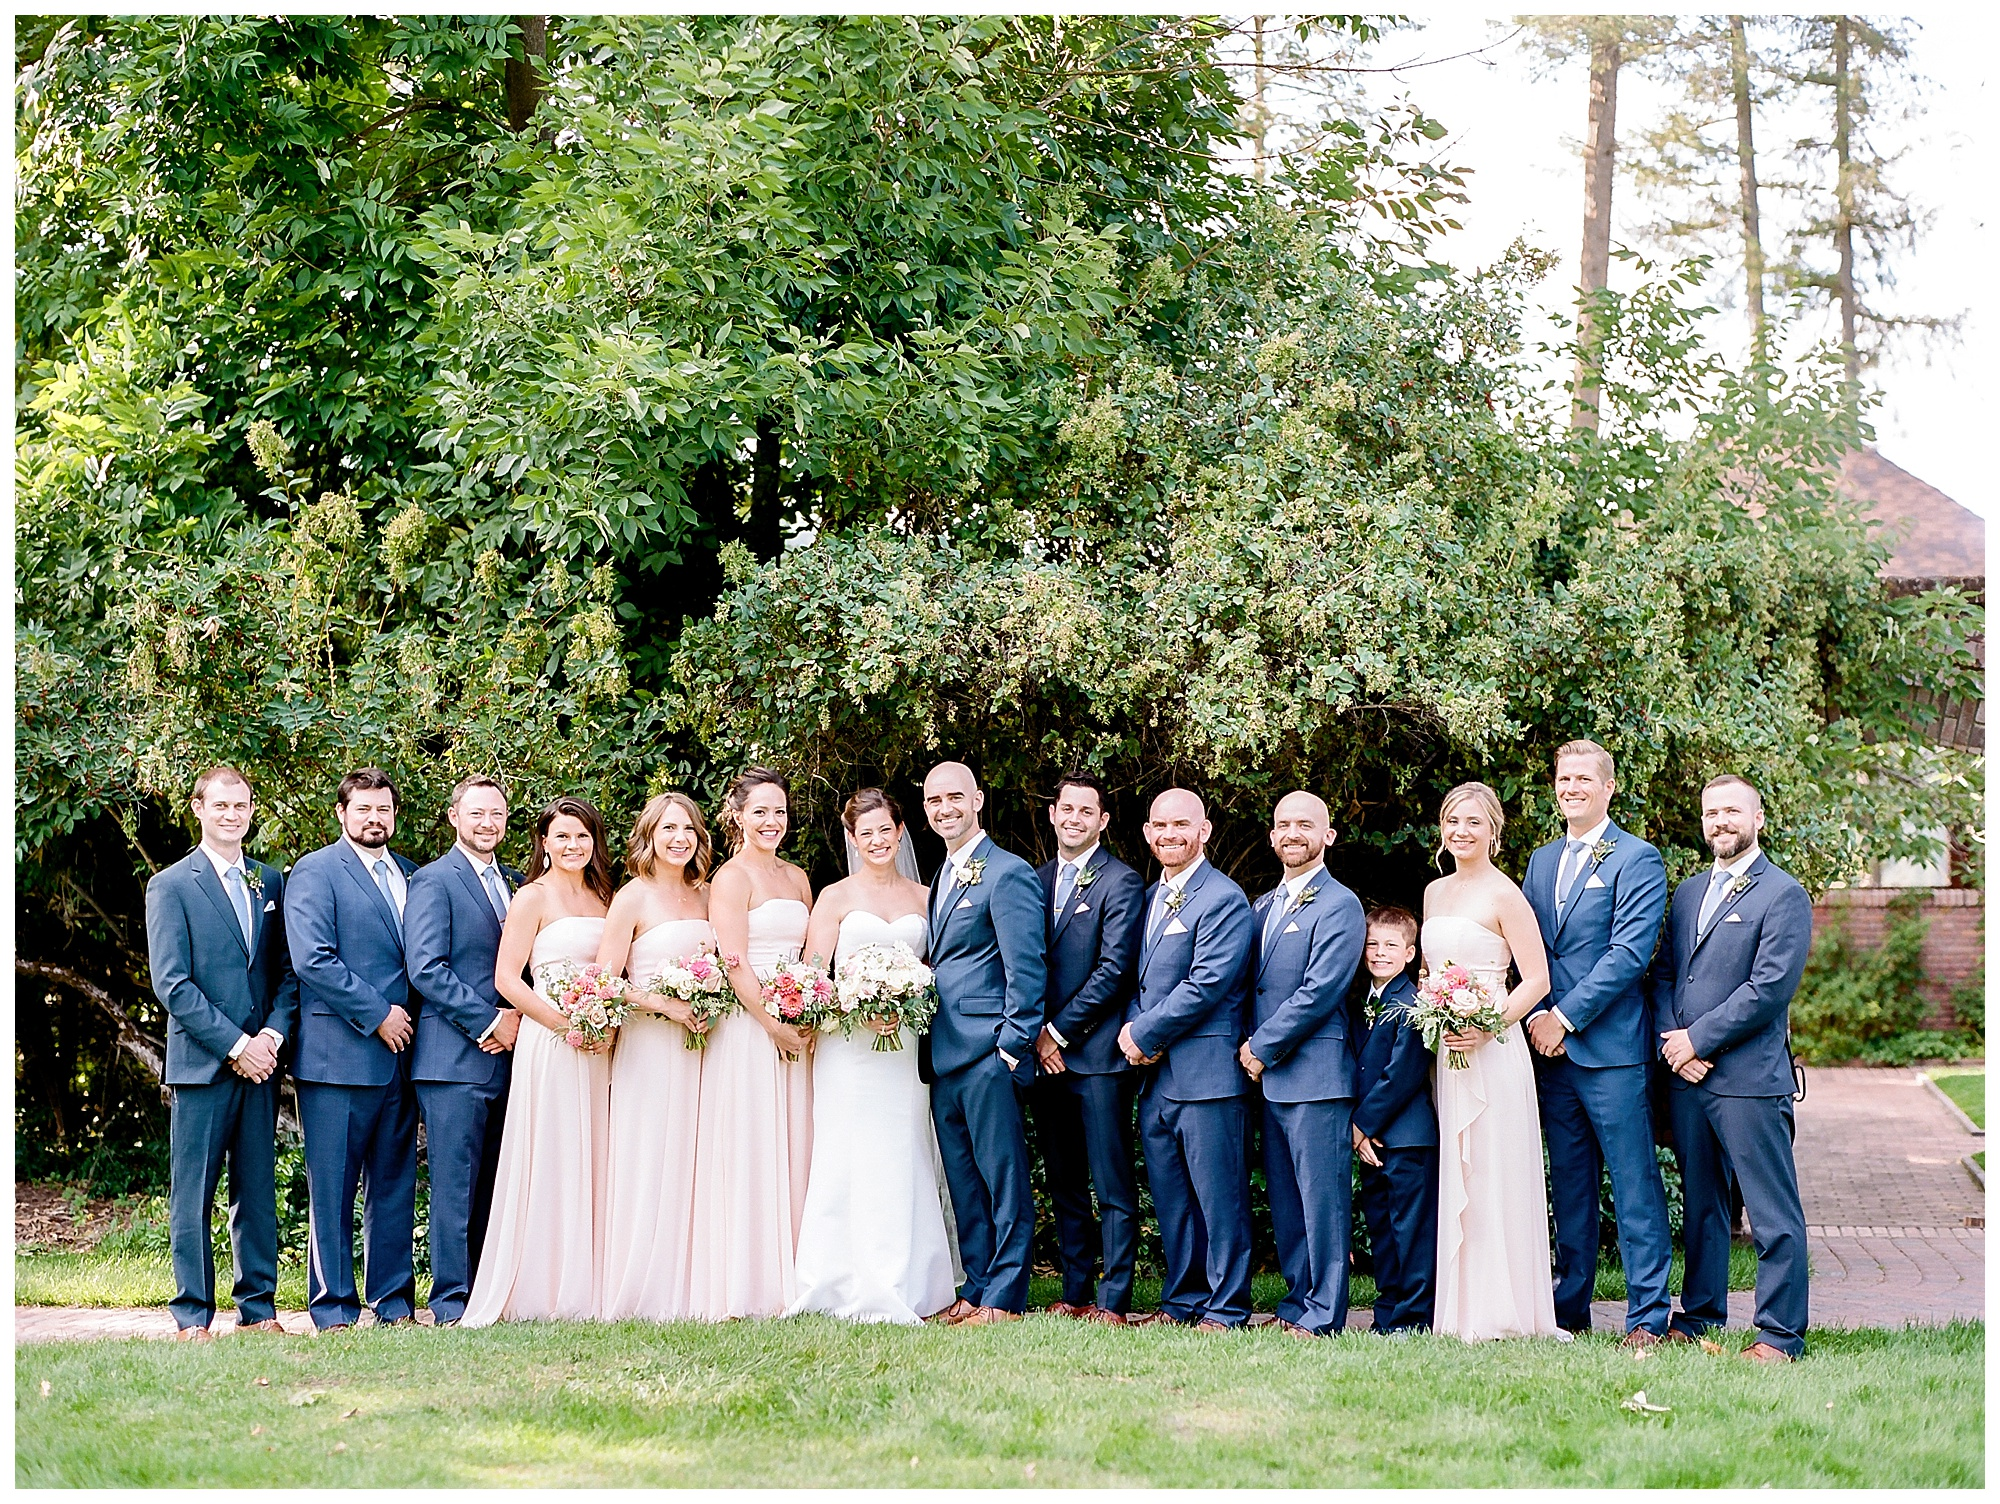 Bozarth-Mansion-wedding-spokane-photography-29.jpg